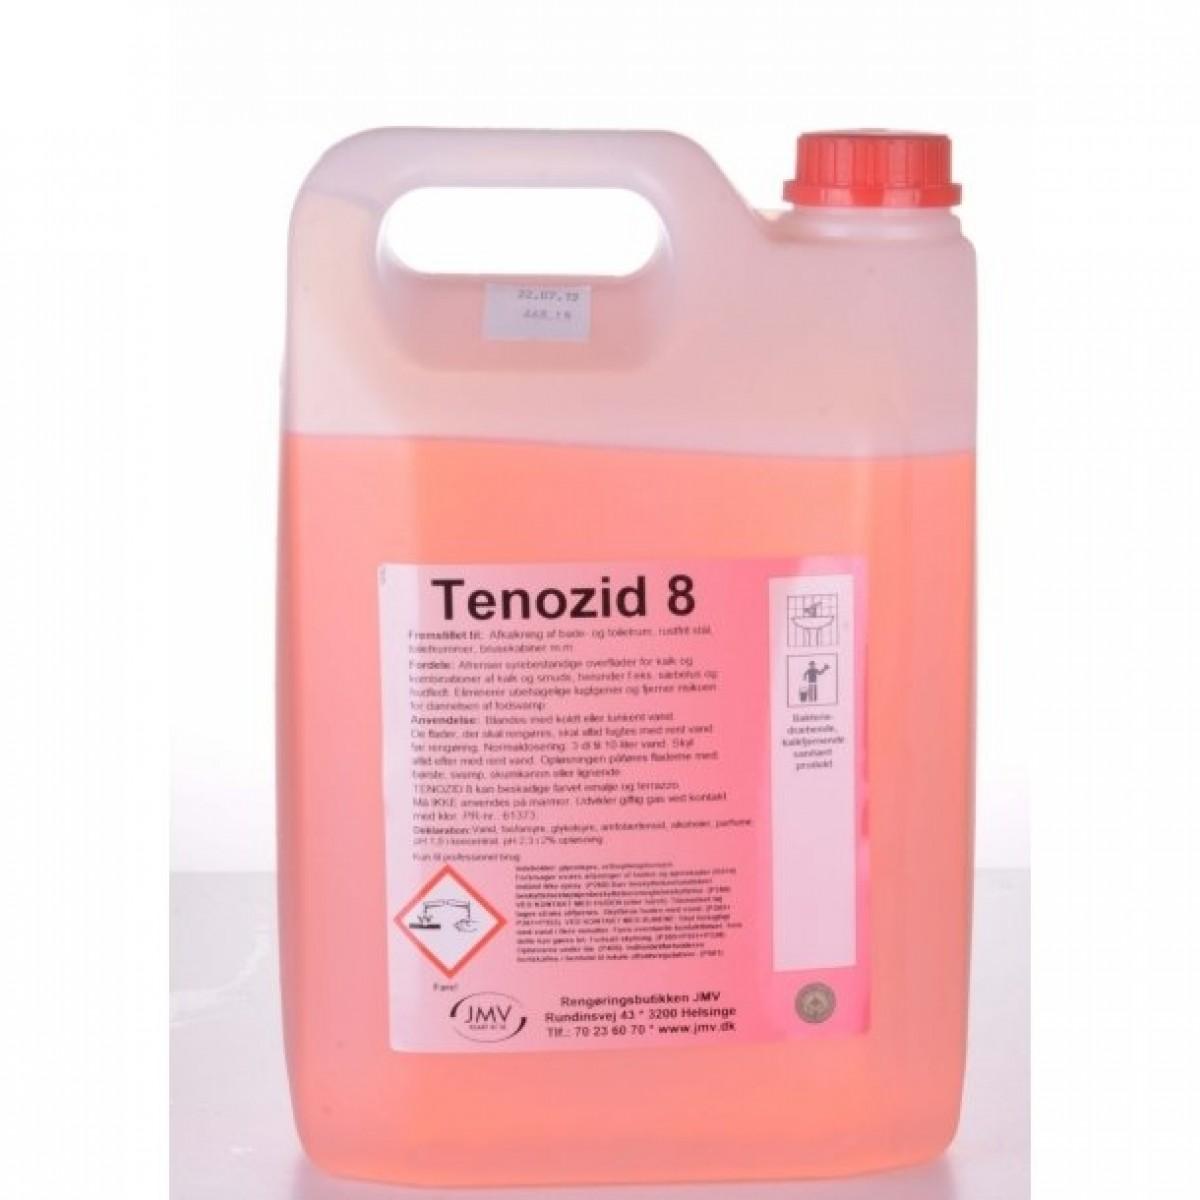 Iduna Tenozid 8 afkalker 5L-31